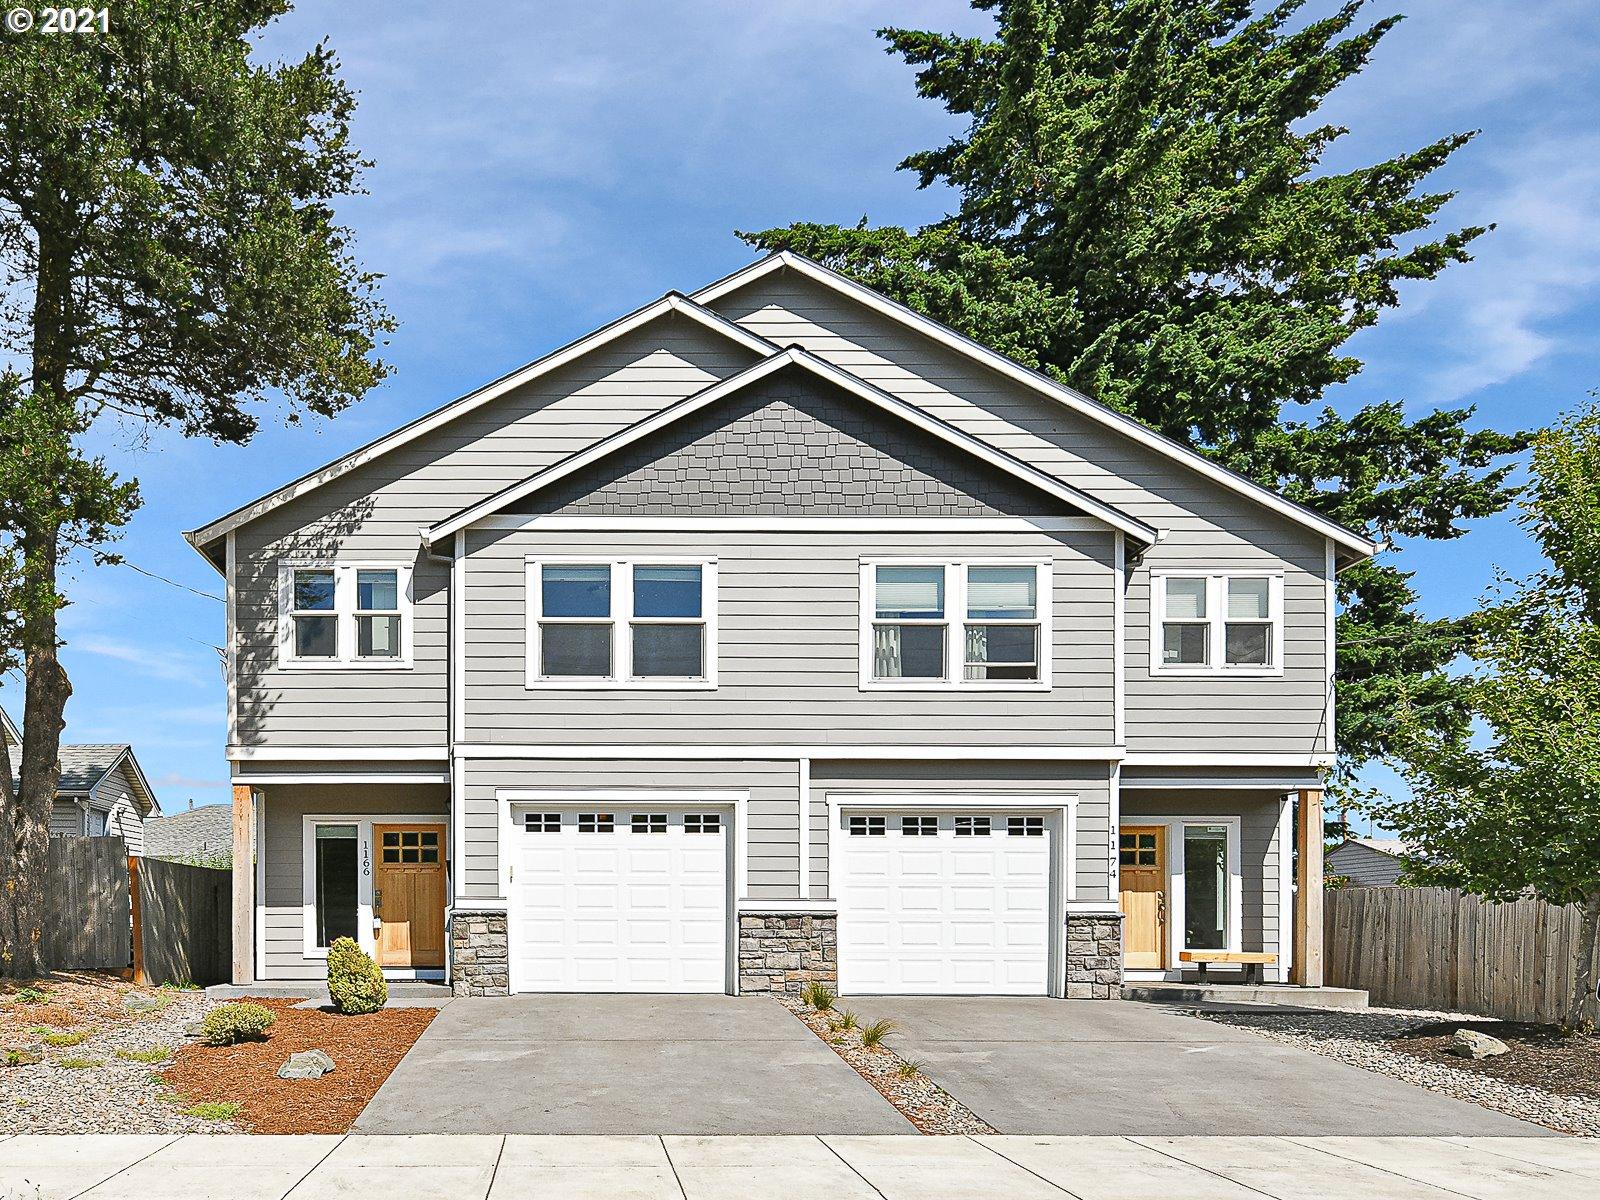 1166 SE 80TH AVE, Portland OR 97215